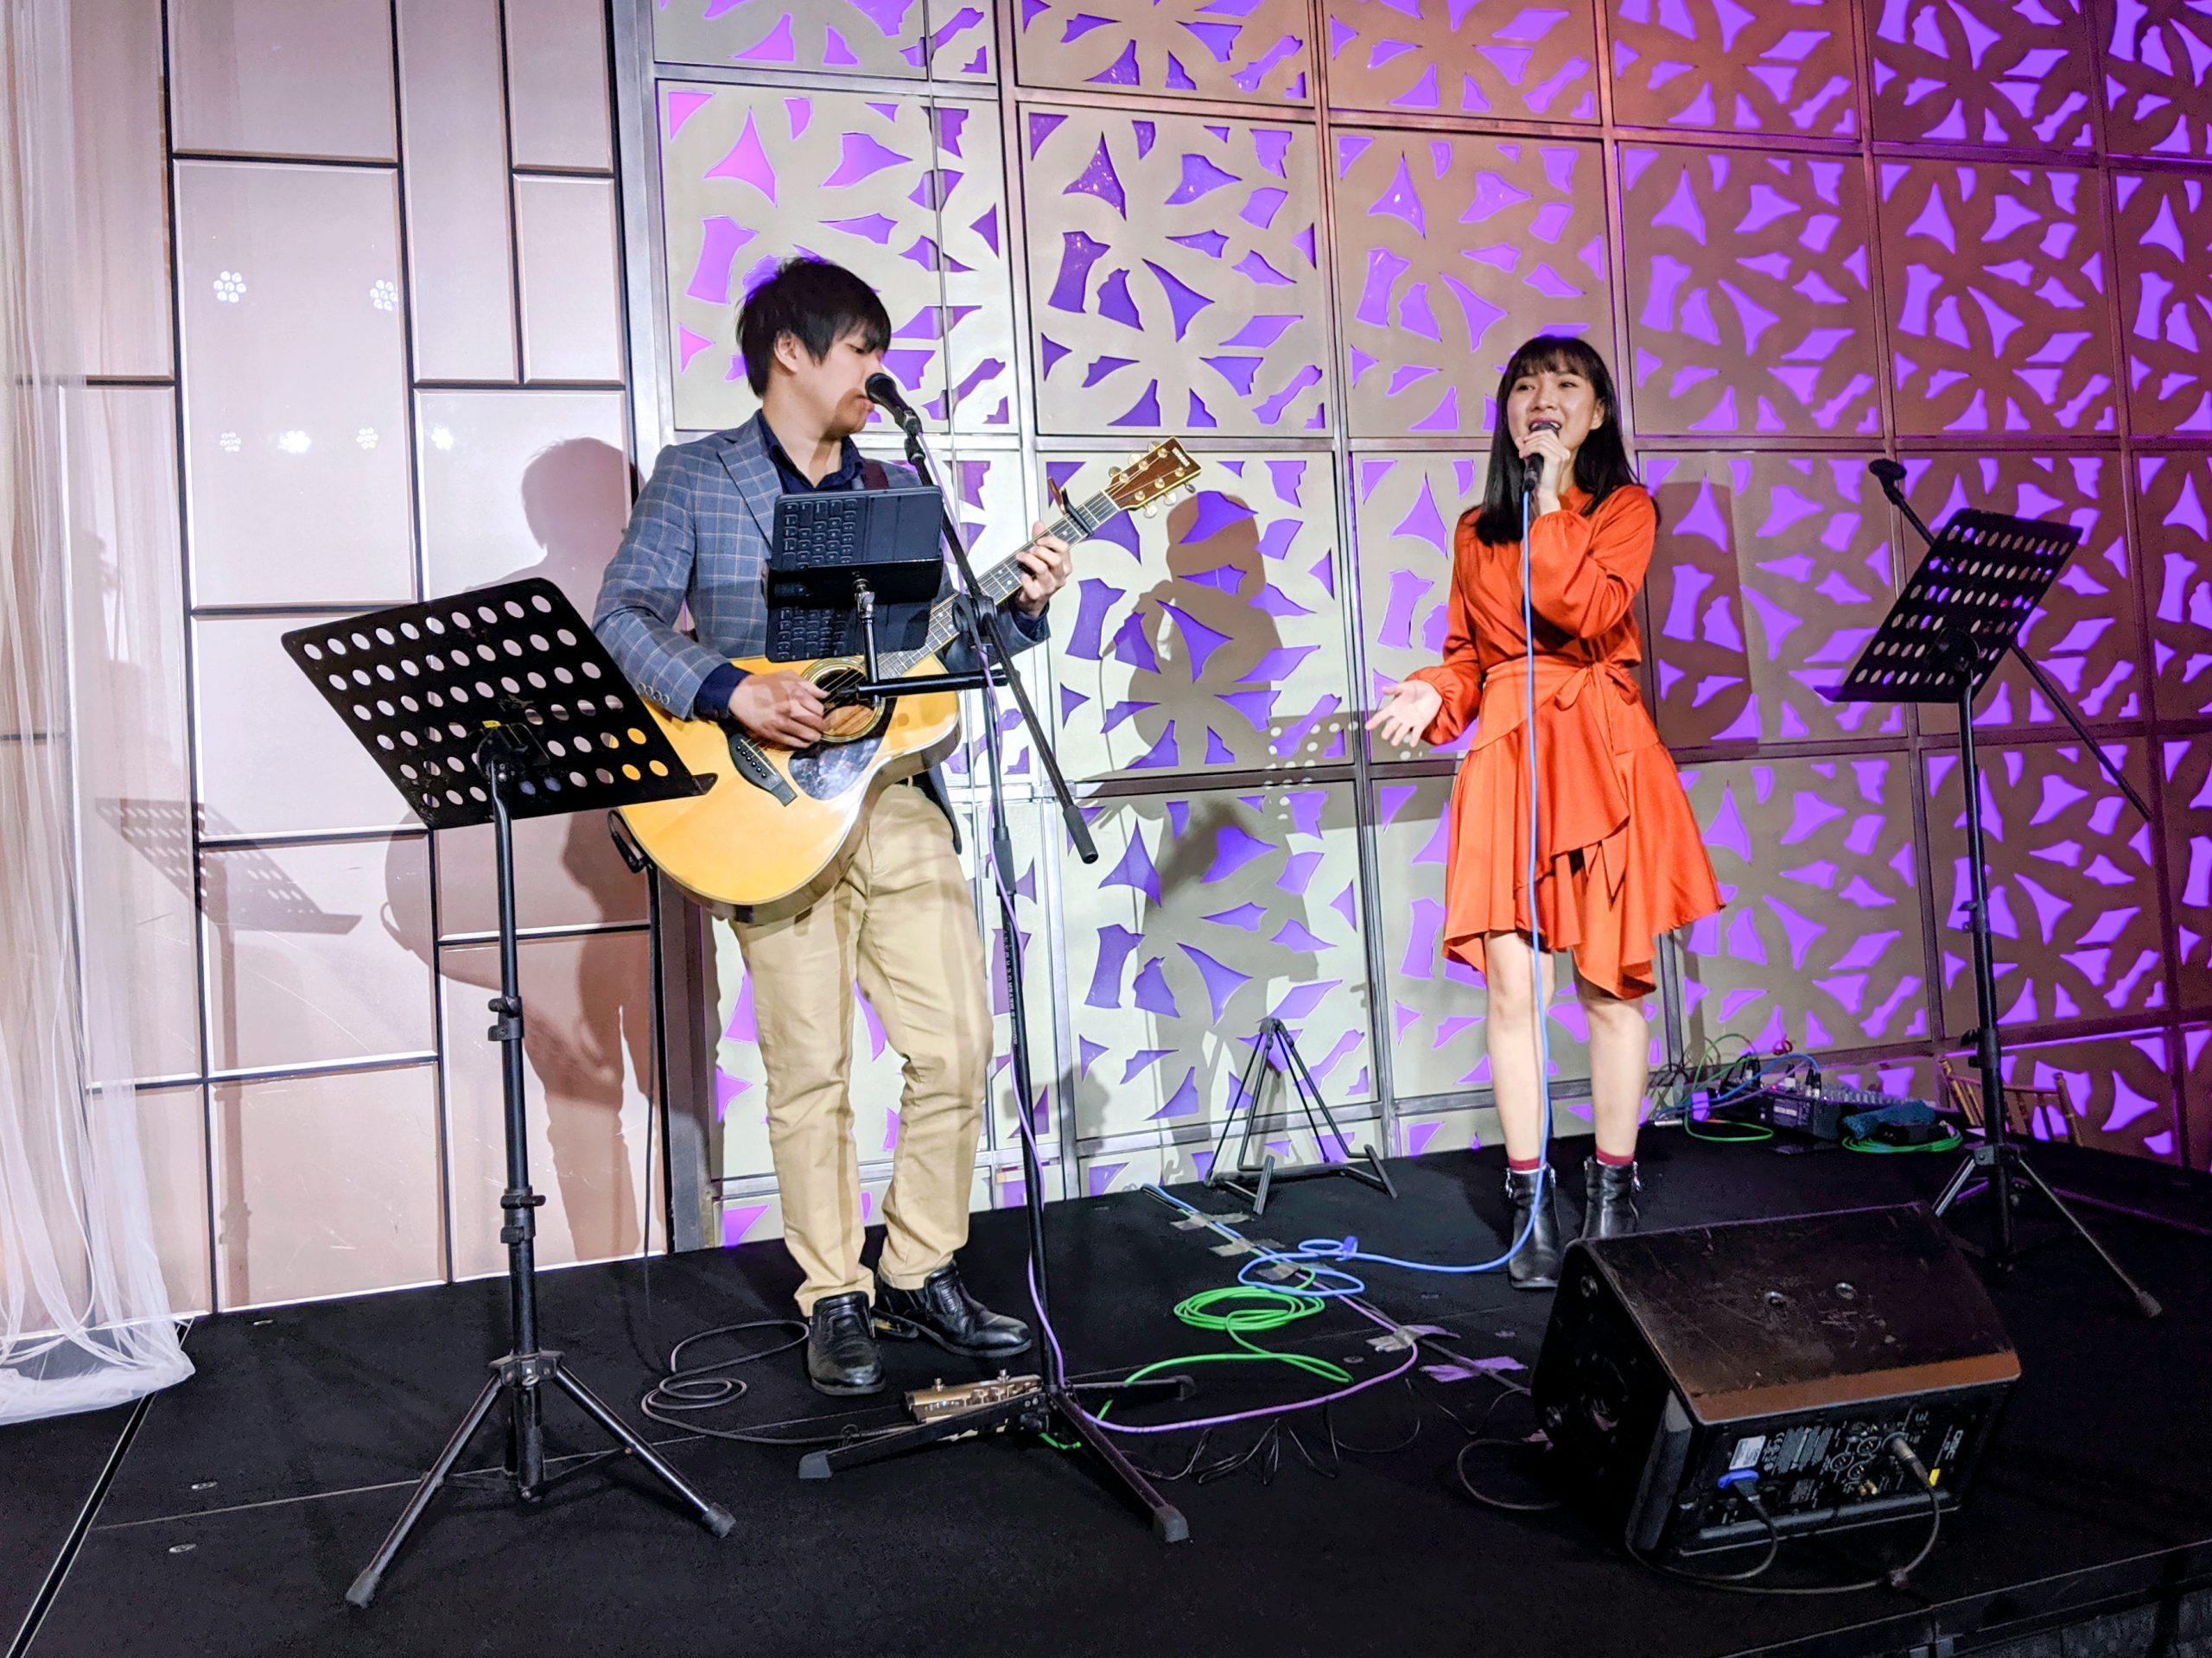 Mandarin Orchard Hotel Singapore Wedding Ballroom Stage Singer Live Band Music Emcee